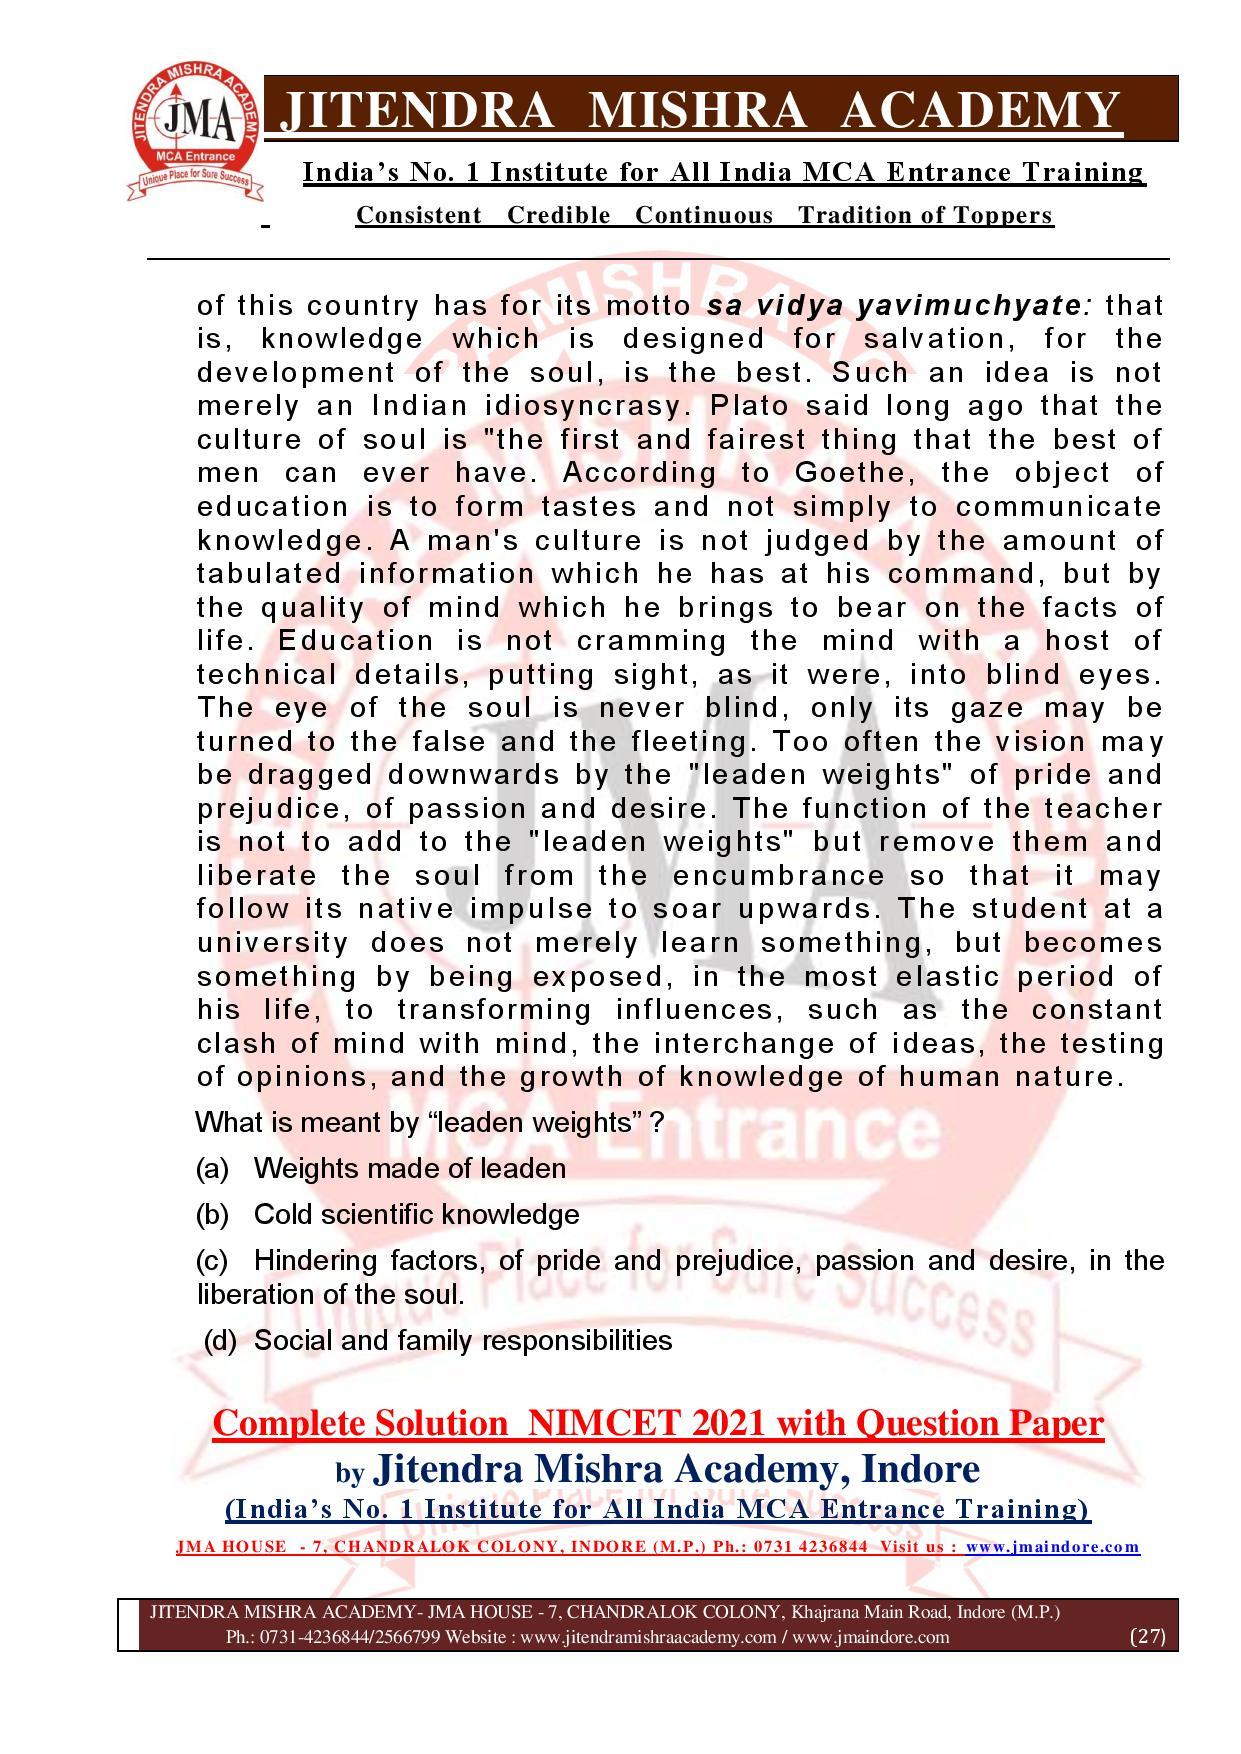 NIMCET 2021 QUESTION PAPER (F)-page-027